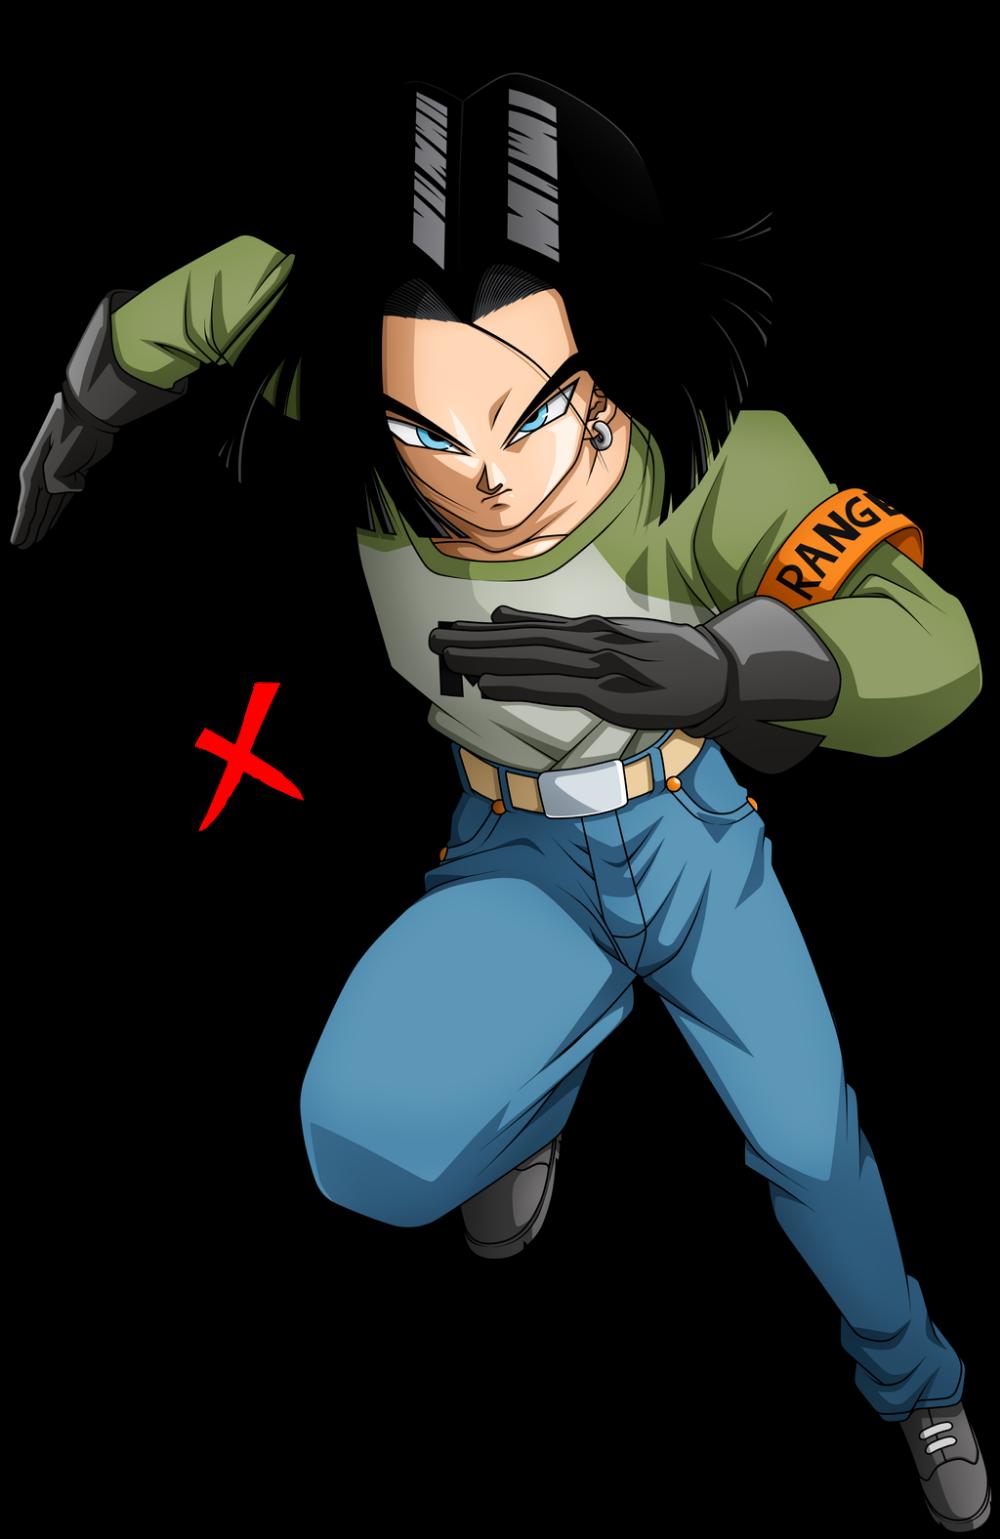 Android 17 5 By Nekoar On Deviantart Anime Dragon Ball Dragon Ball Super Dragon Ball